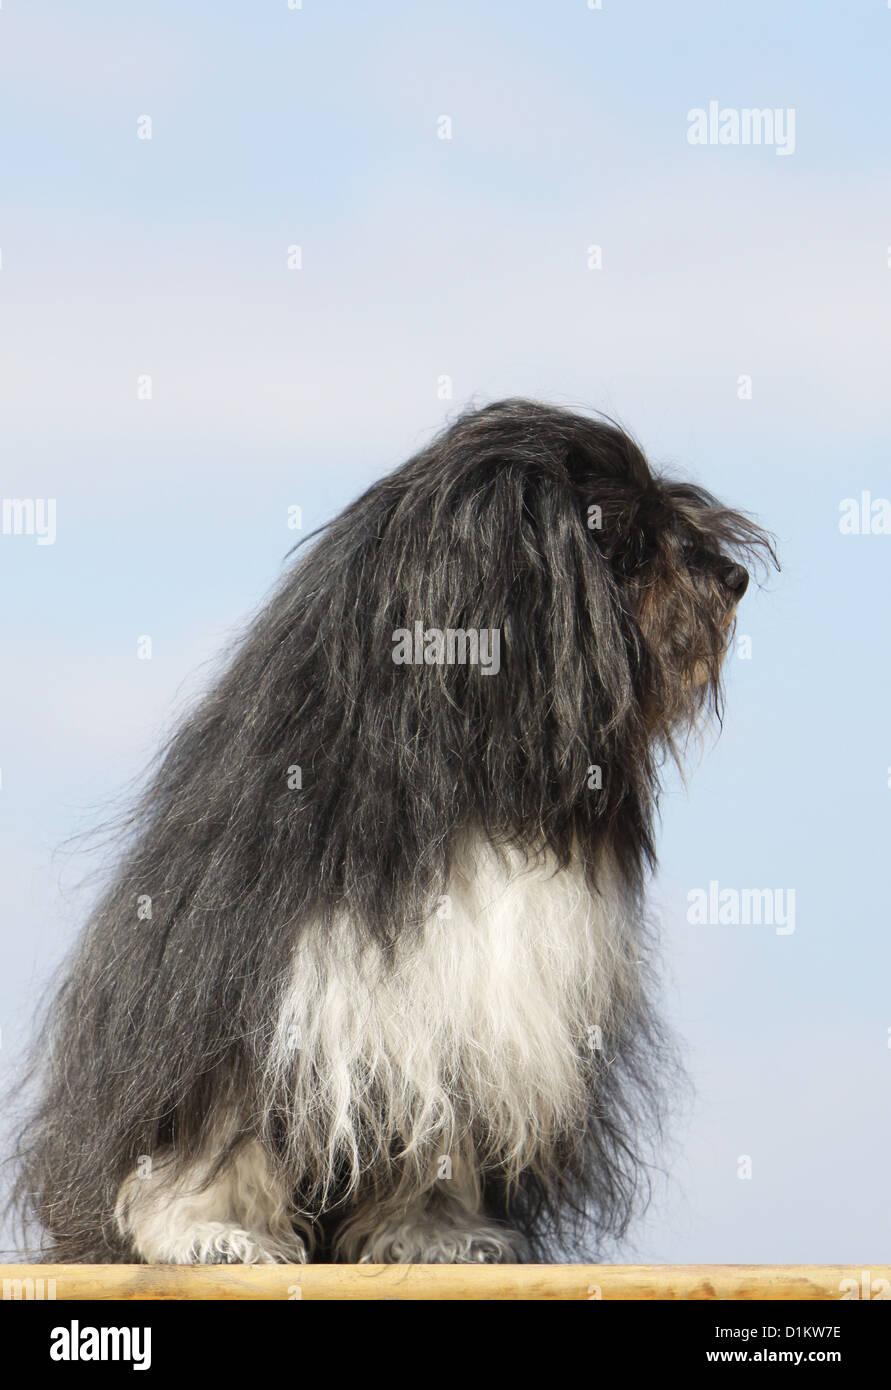 Lion sitting profile - photo#7